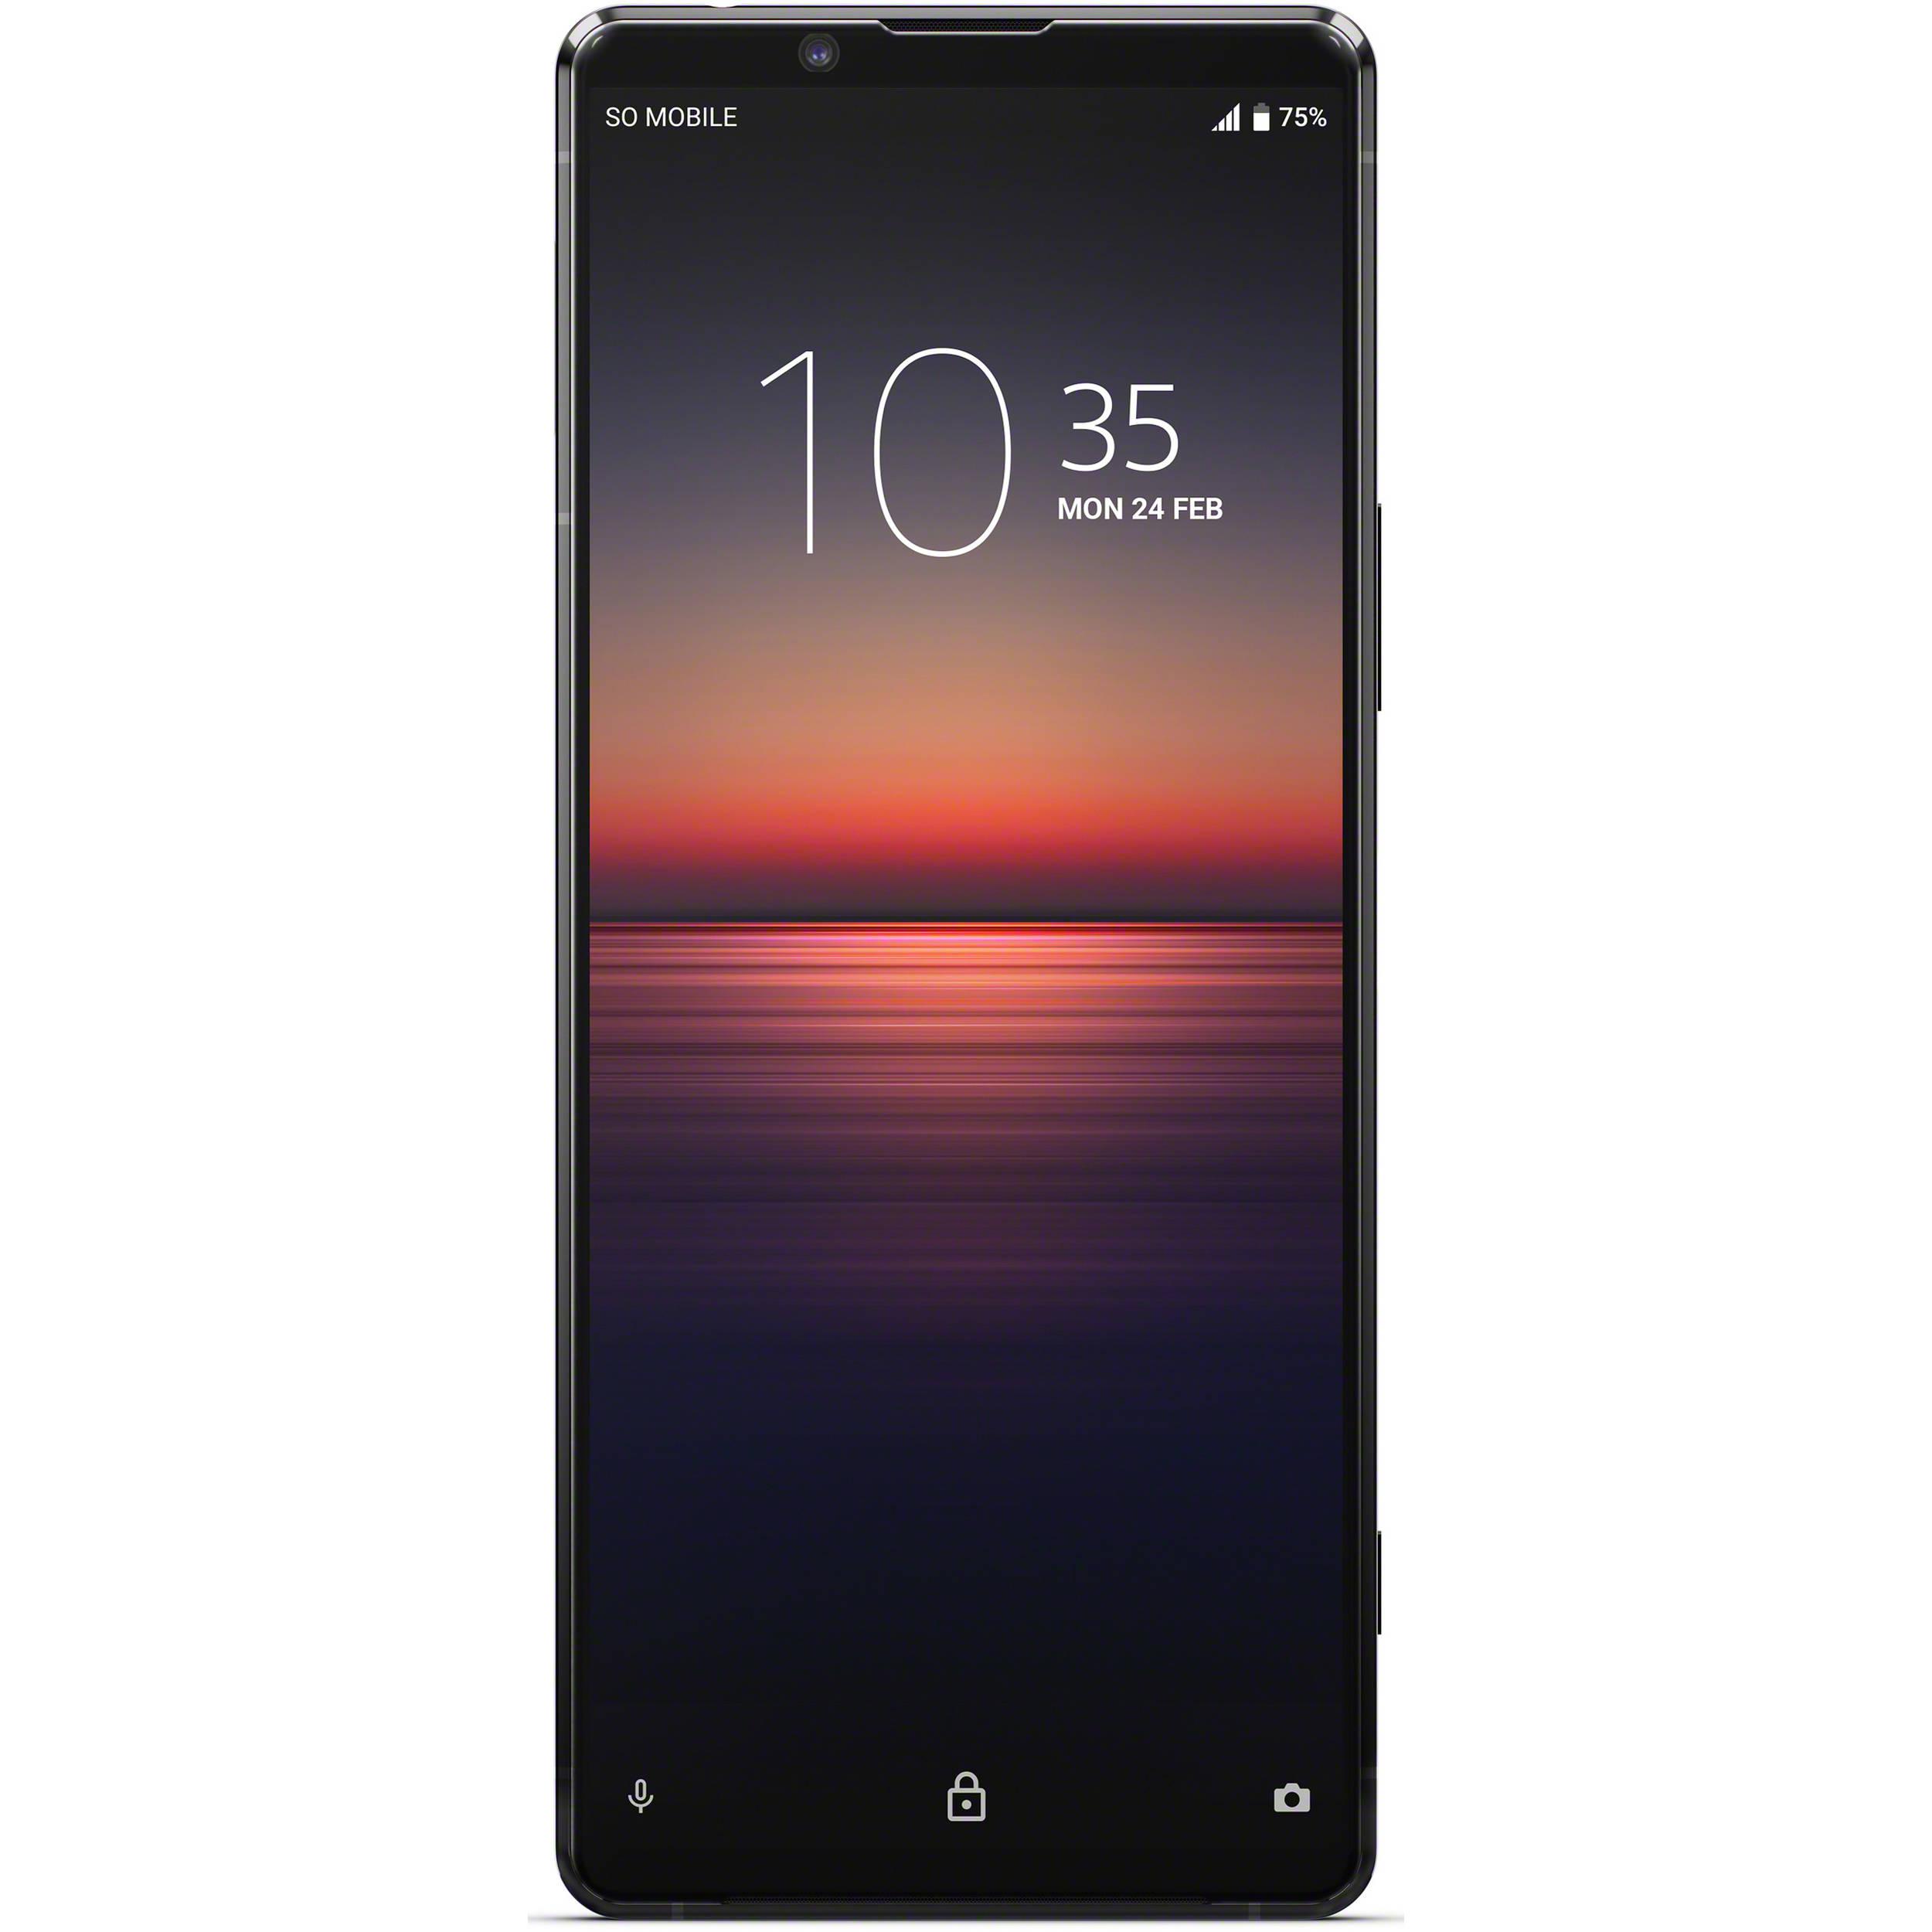 Sony Xperia 1 Ii 256gb Smartphone Unlocked Xqat51 B B H Photo